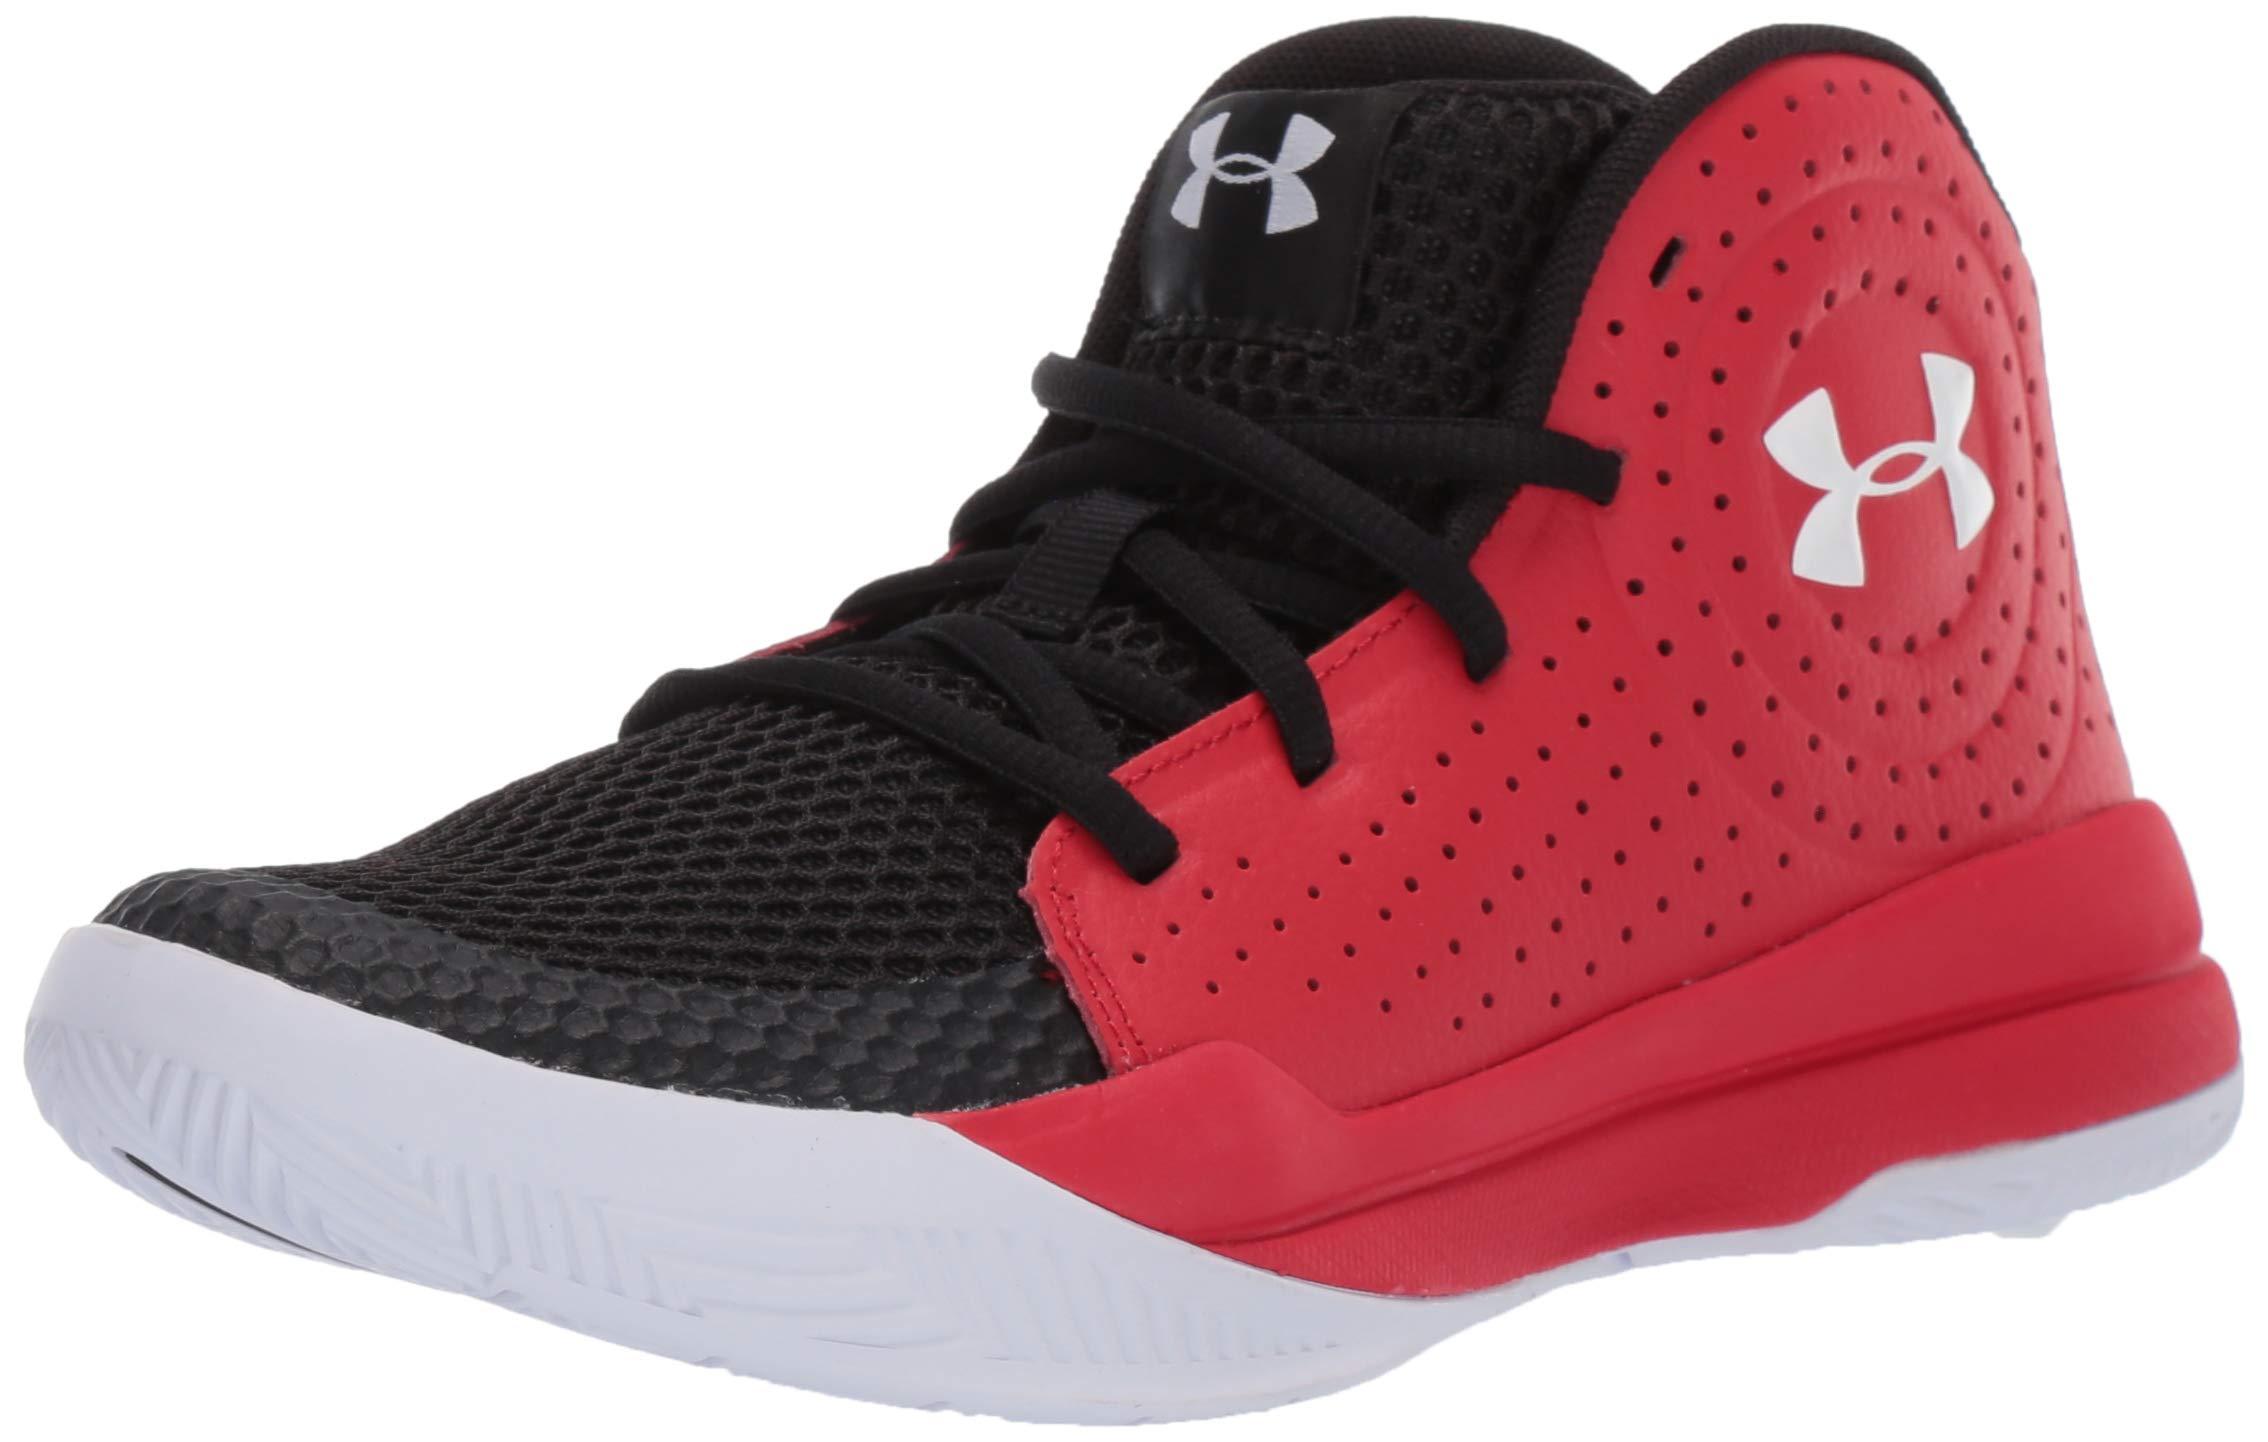 Under Armour Unisex Pre School Jet 2019 Basketball Shoe, Red (601)/Black, 4.5 M US Big Kid